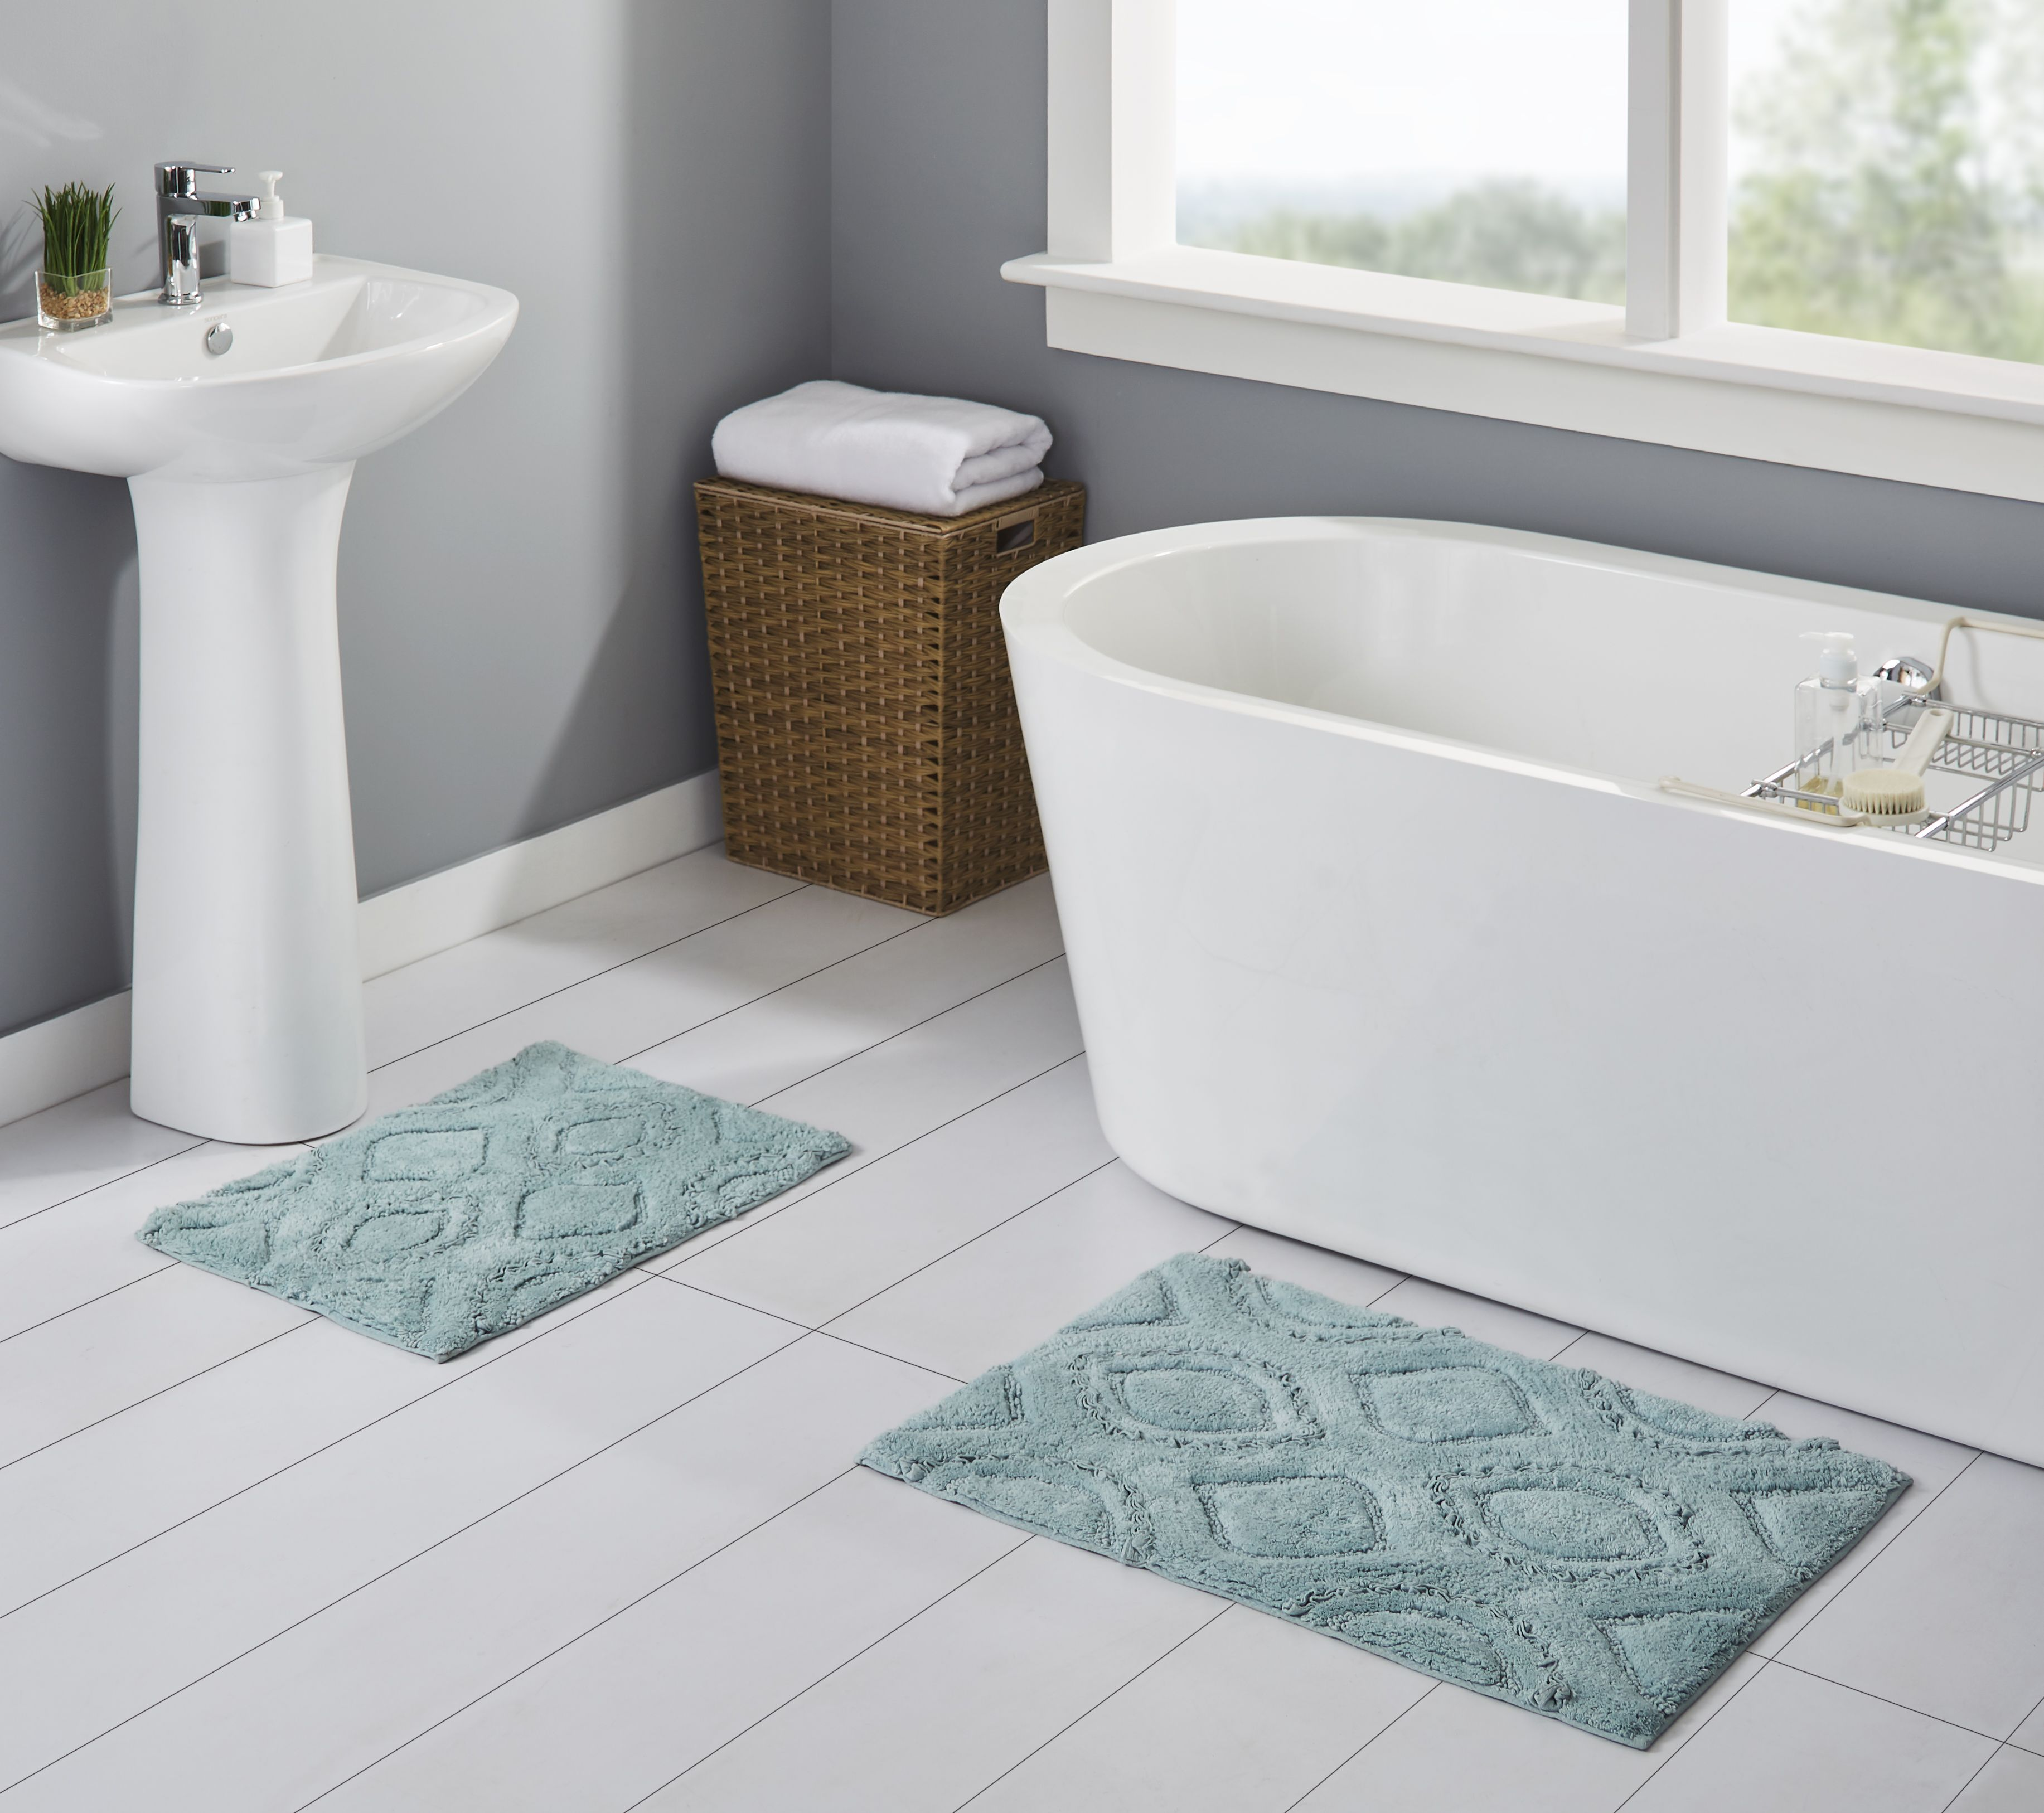 Better Homes Gardens Ruffle Ogee Cotton Bath Rug Set Aquifer 2 Pieces Walmart Com In 2021 Badezimmer Umgestalten Badezimmer Baden [ 3252 x 3666 Pixel ]